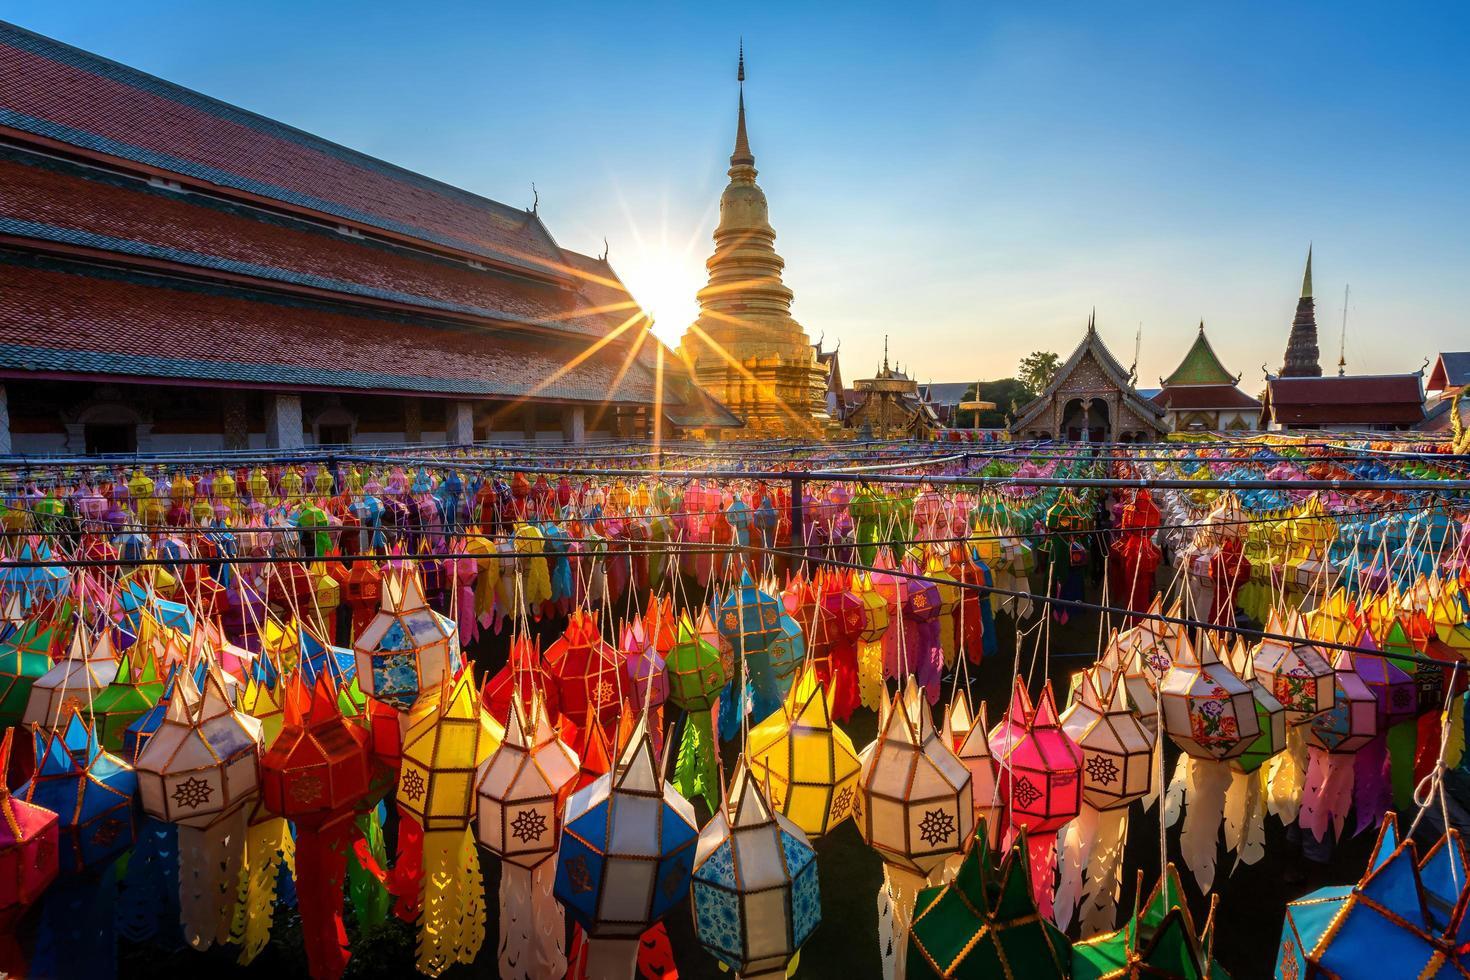 le lanterne variopinte si avvicinano al tempio buddista a Lamphun, Tailandia. foto